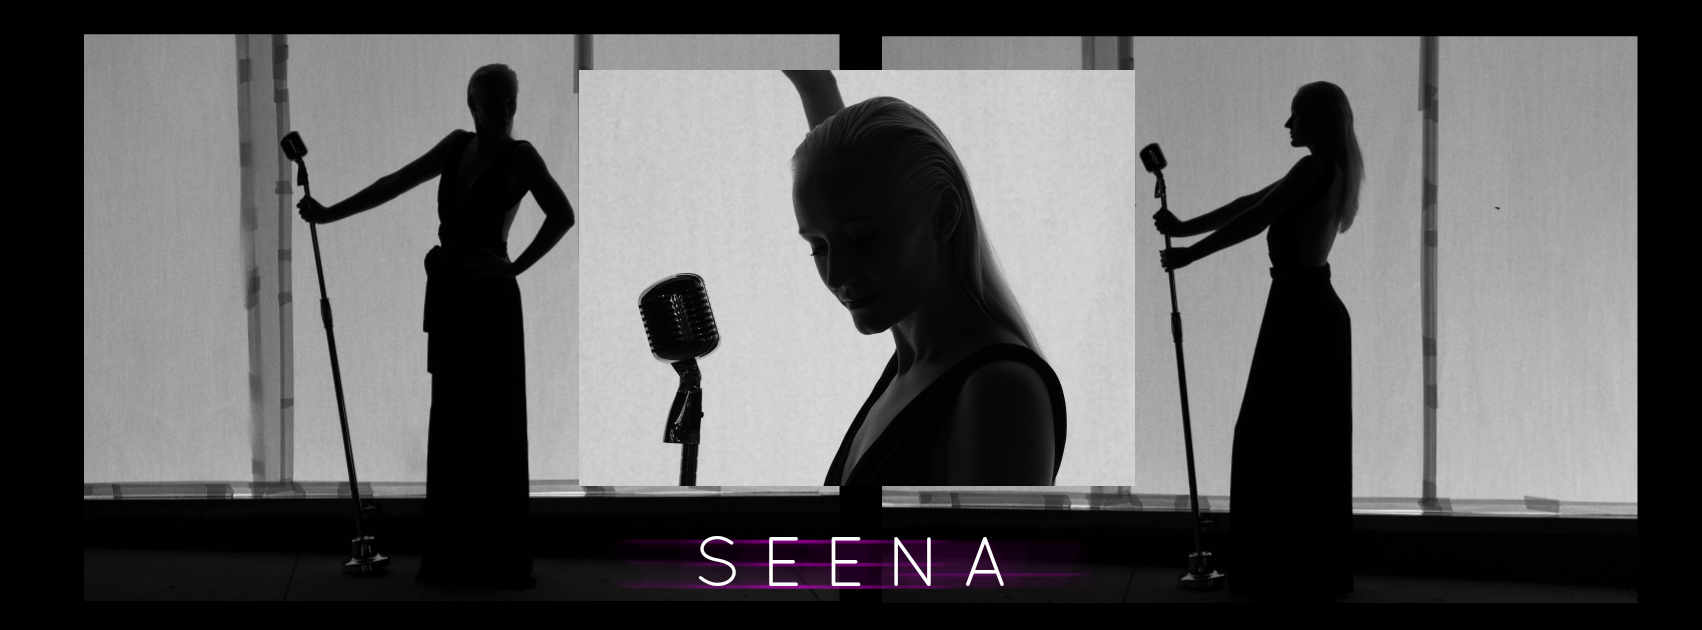 Seena-Full-Bio.jpg